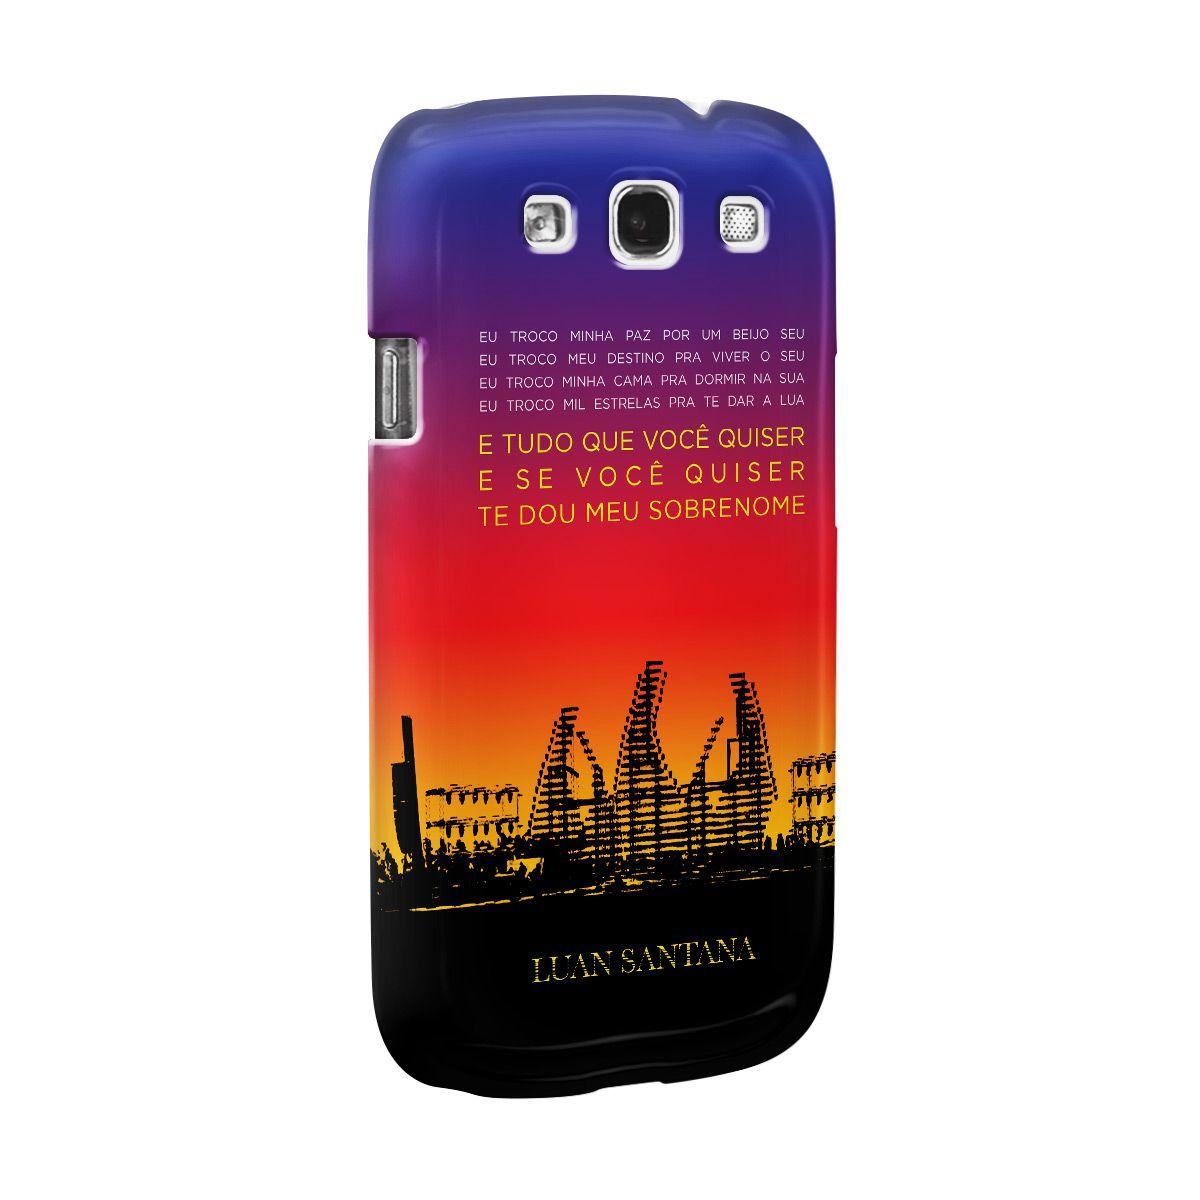 Capa para Celular Samsung Galaxy S3 Luan Santana Concept